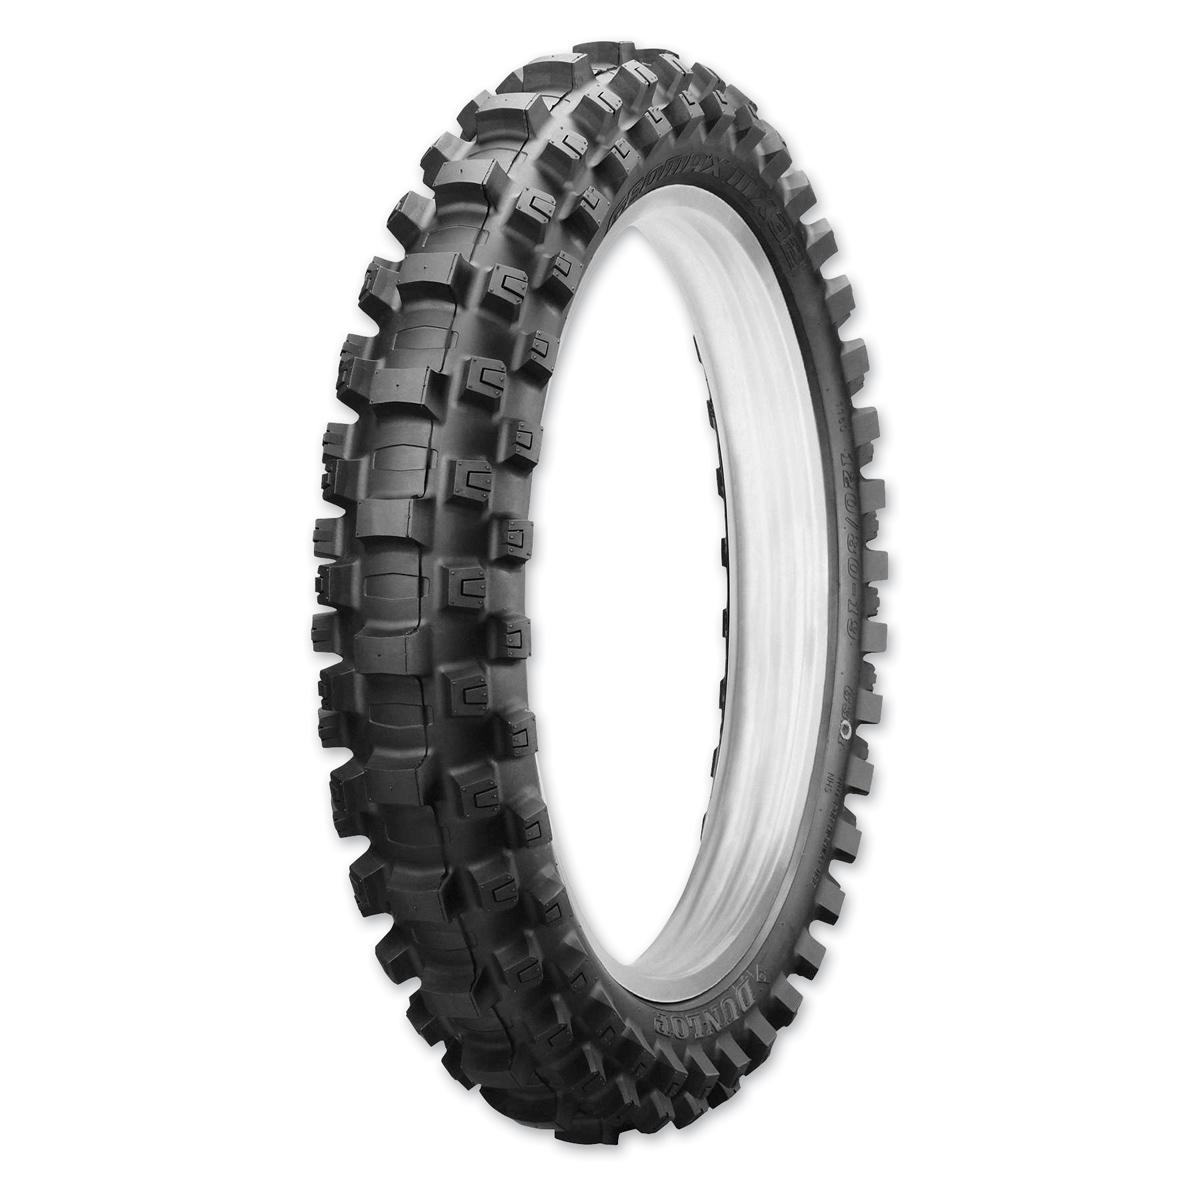 Dunlop MX3S/32 120/80-19 S/T-I/T Rear Tire